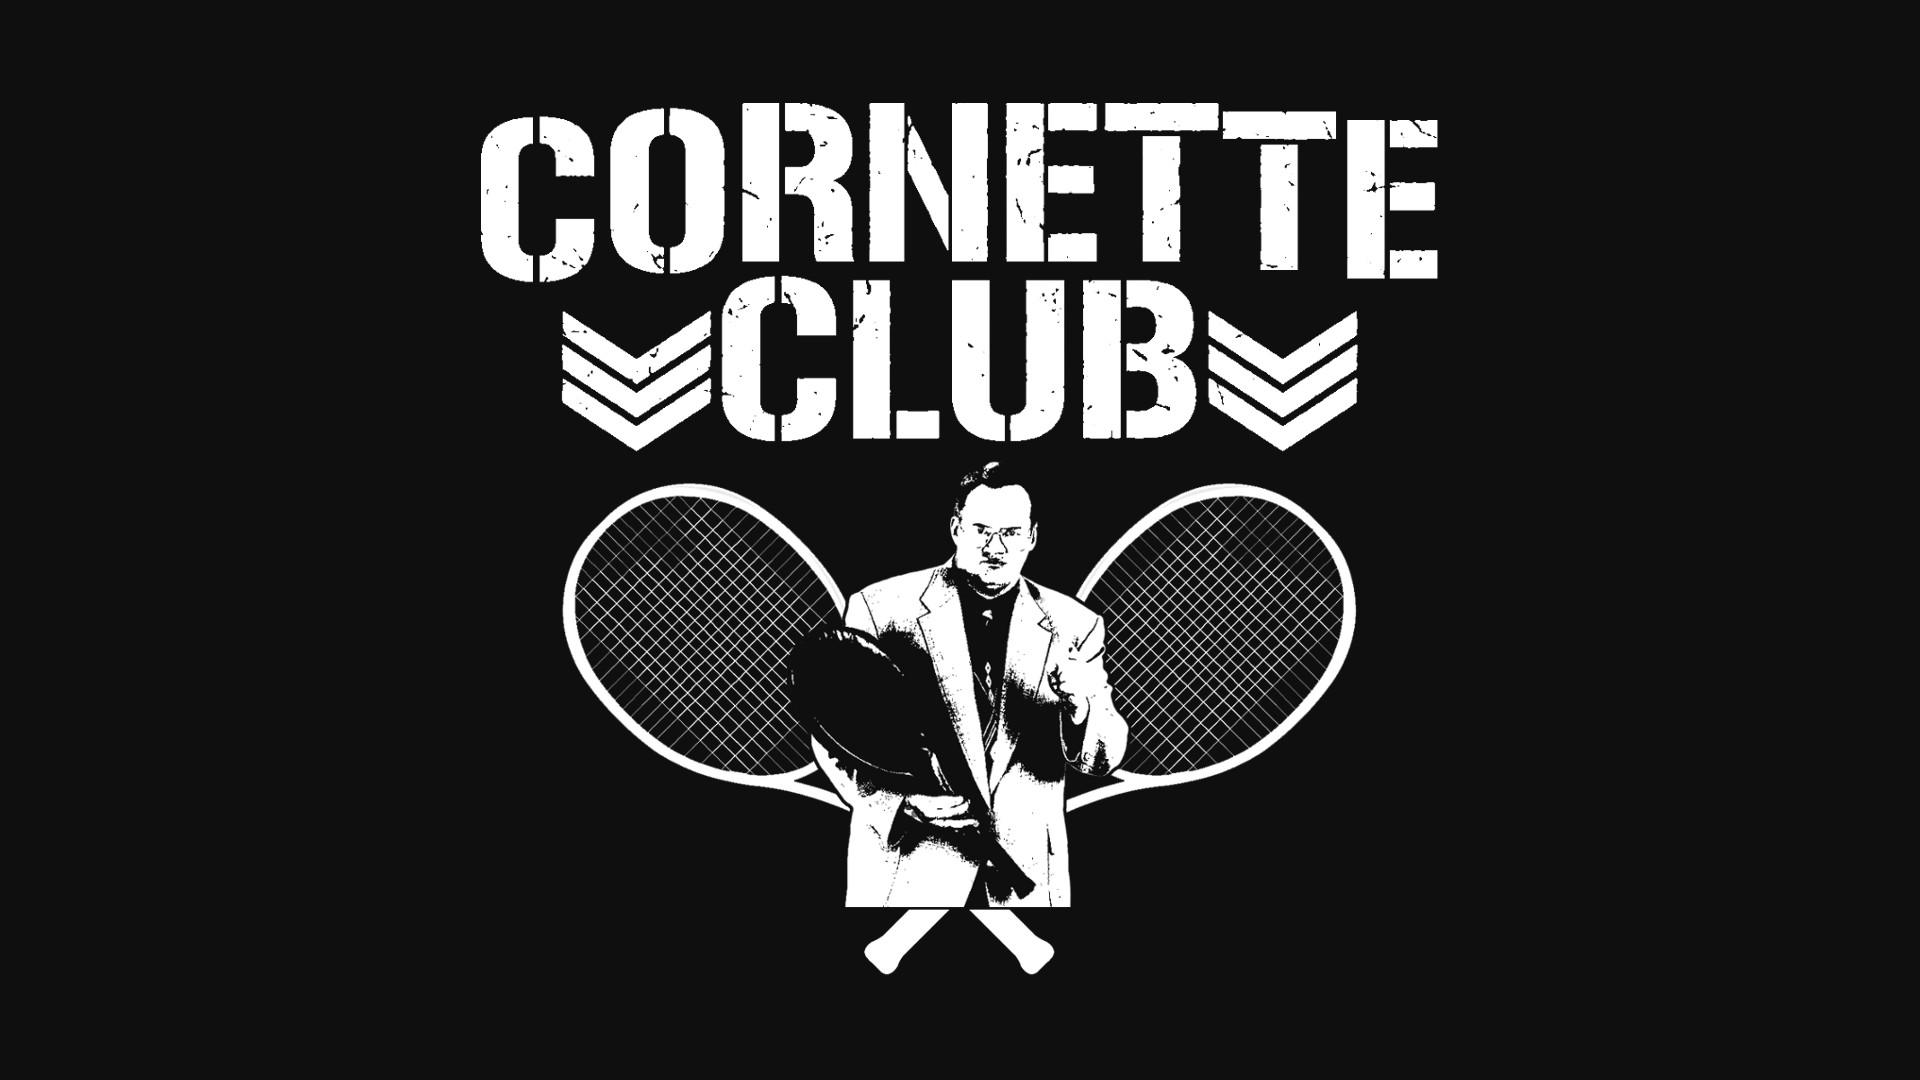 … DarkVoidPictures Cornette Club Wallpaper (1080p) by DarkVoidPictures